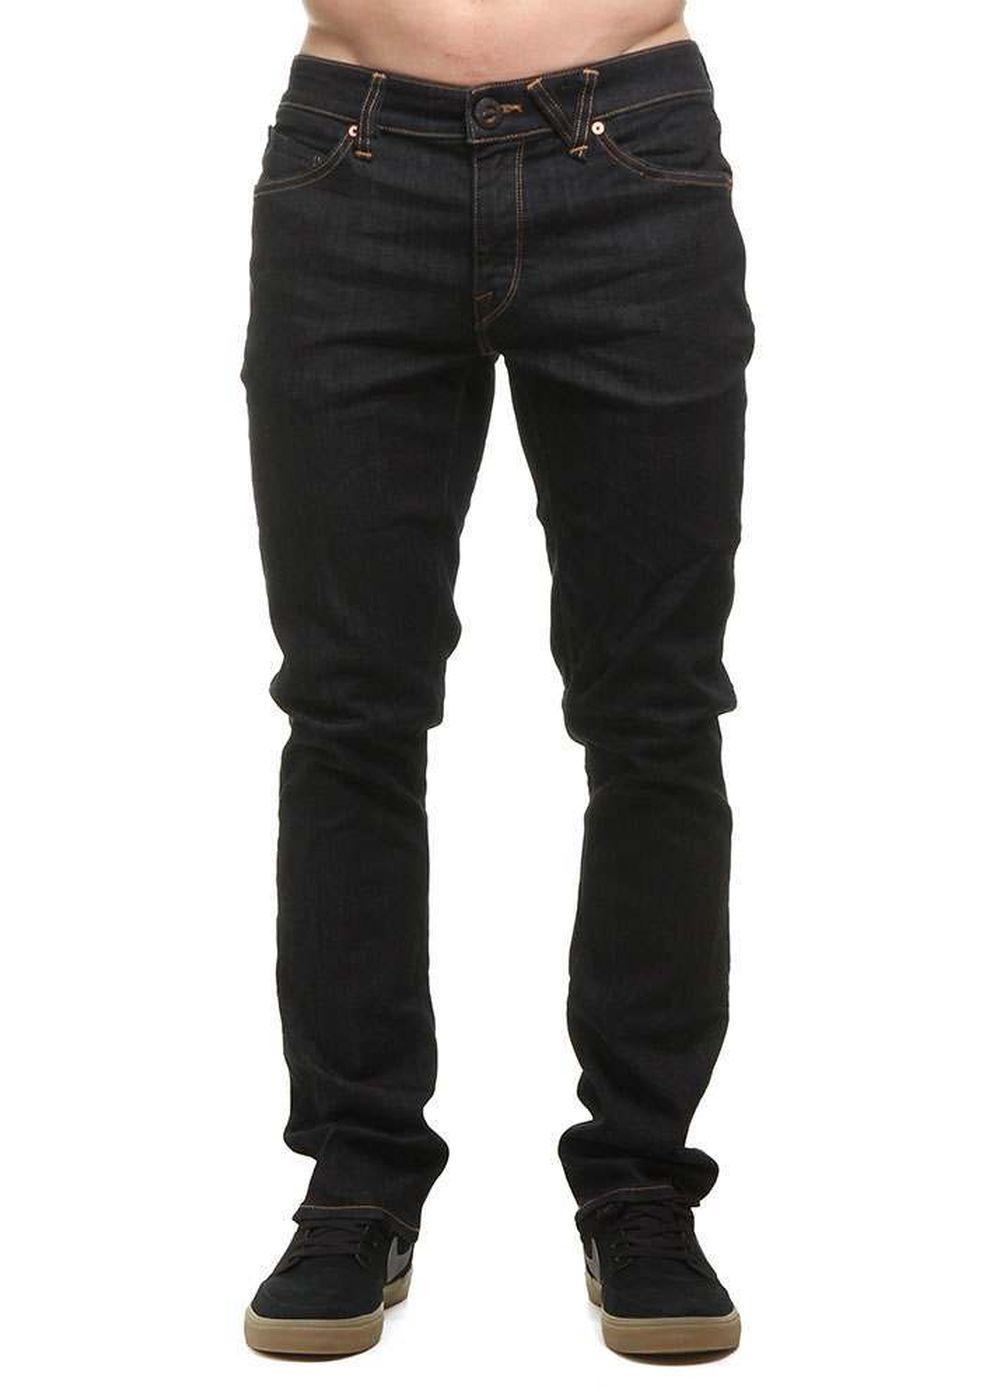 volcom-vorta-jeans-rinse